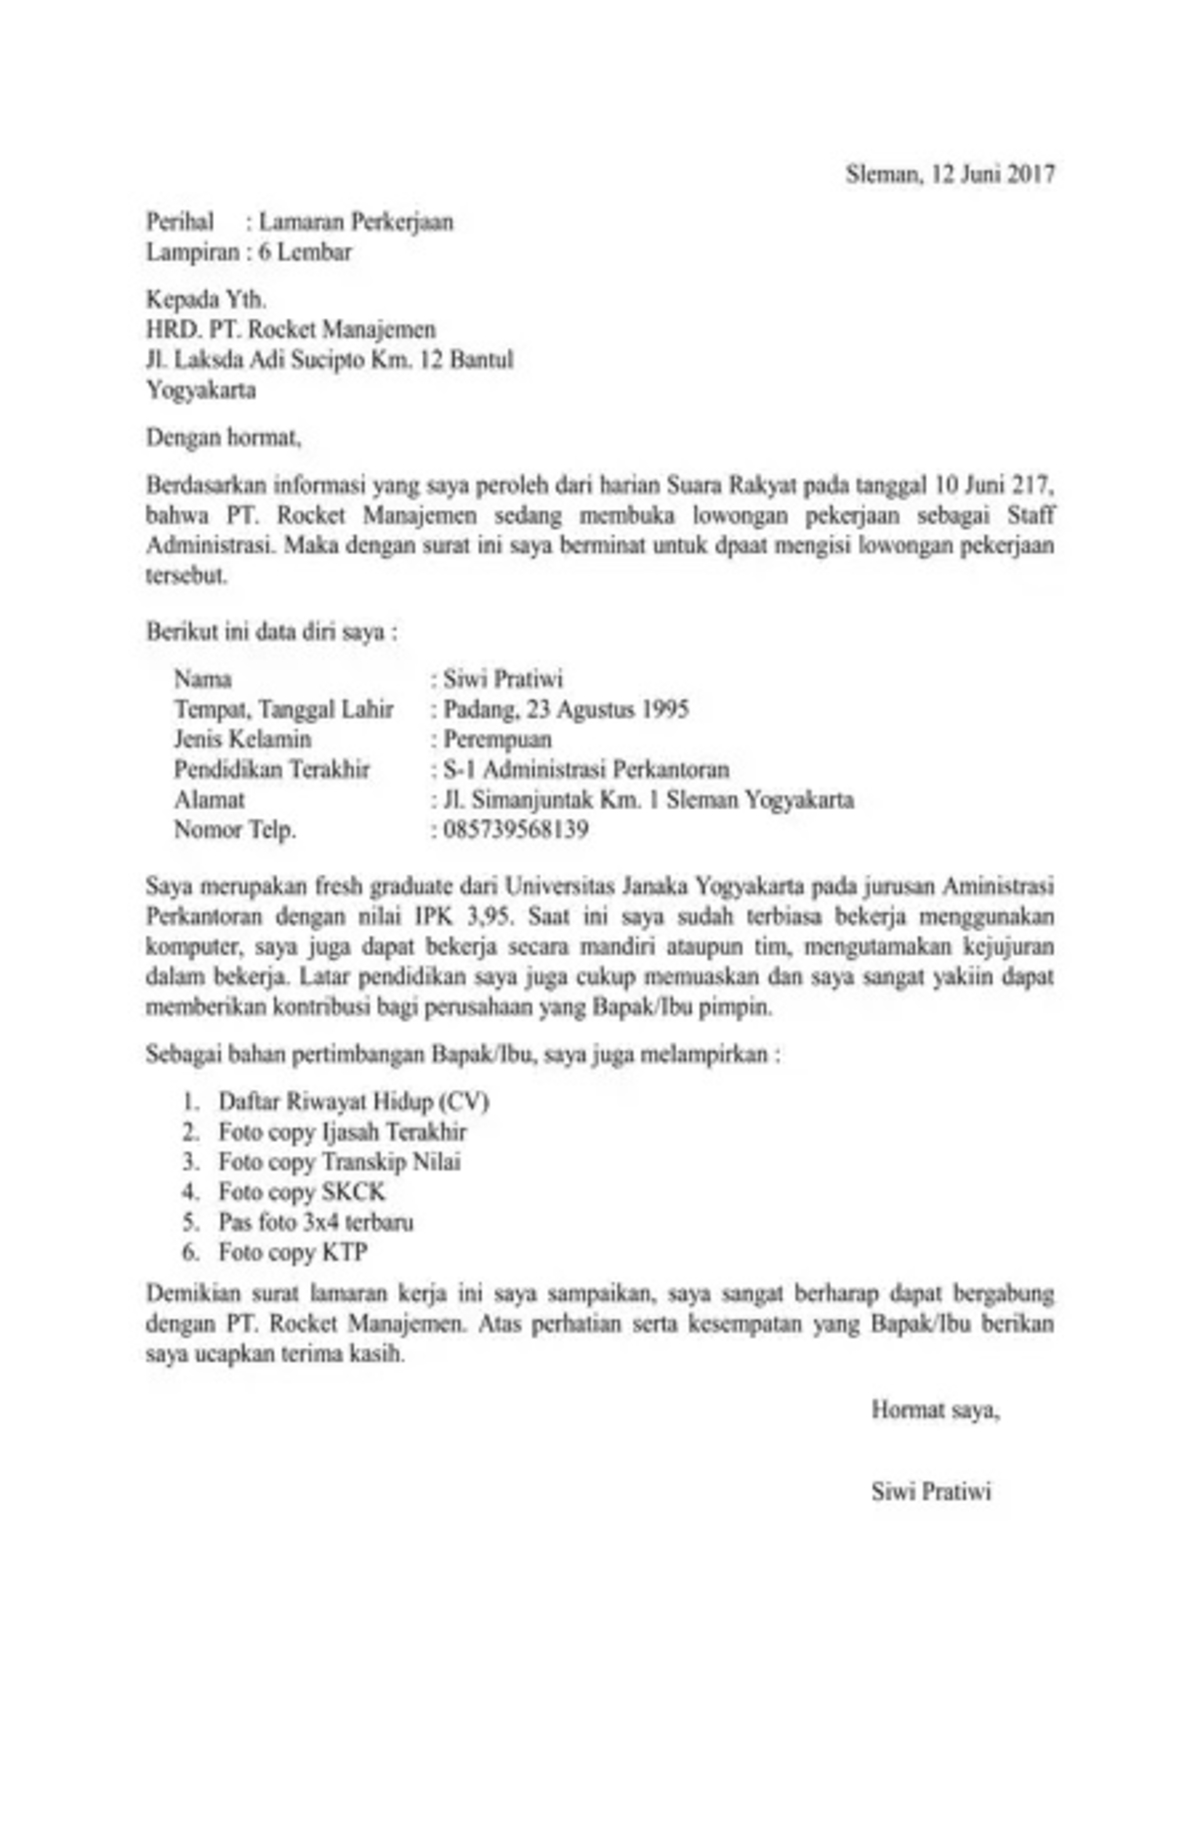 Contoh Surat Lamaran Kerja Yang Tepat Cermati